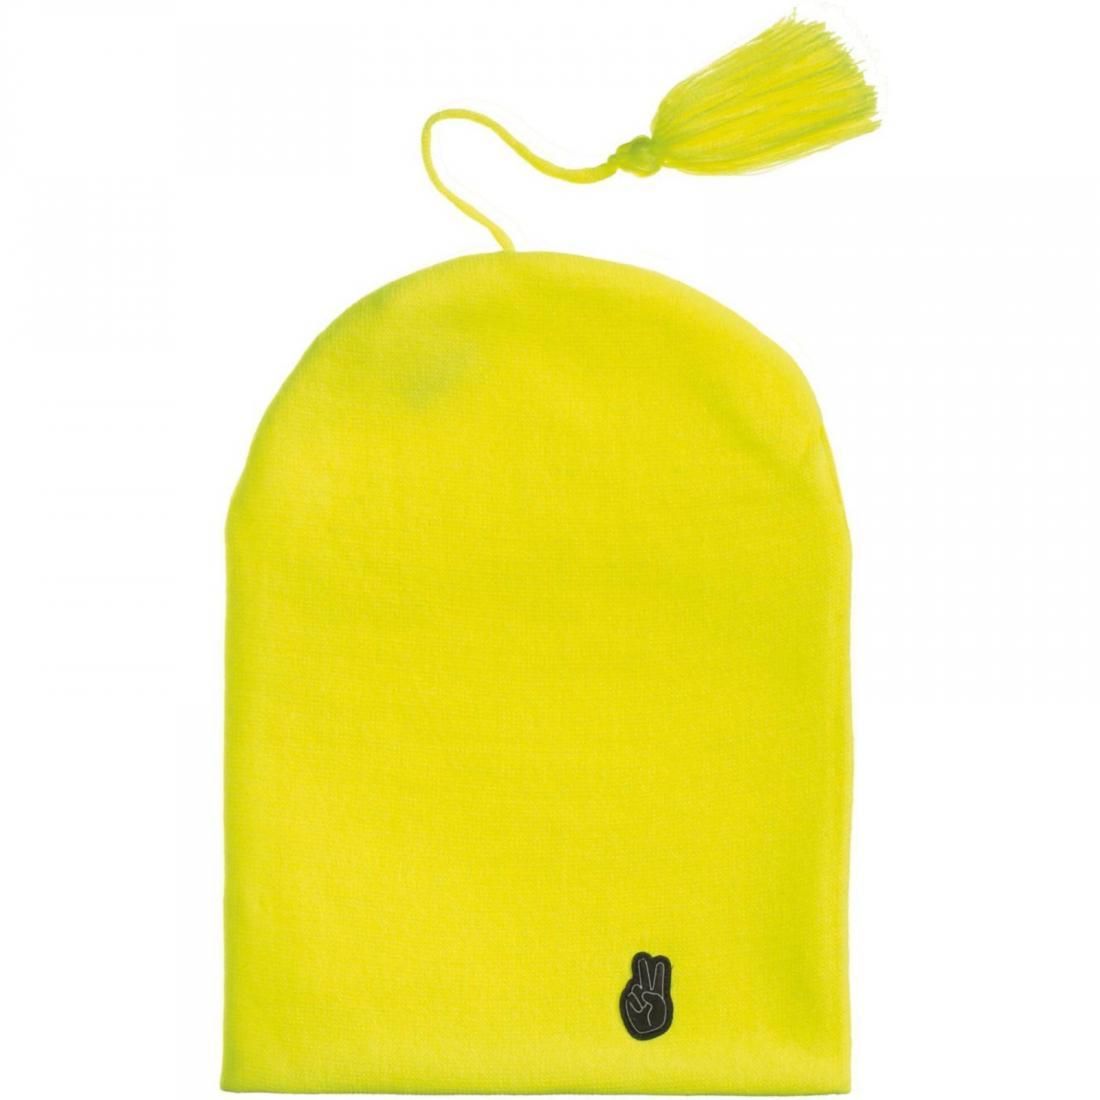 Шапка NisseШапки<br>Состав: 100% Акрил<br><br>Цвет: Желтый<br>Размер: None